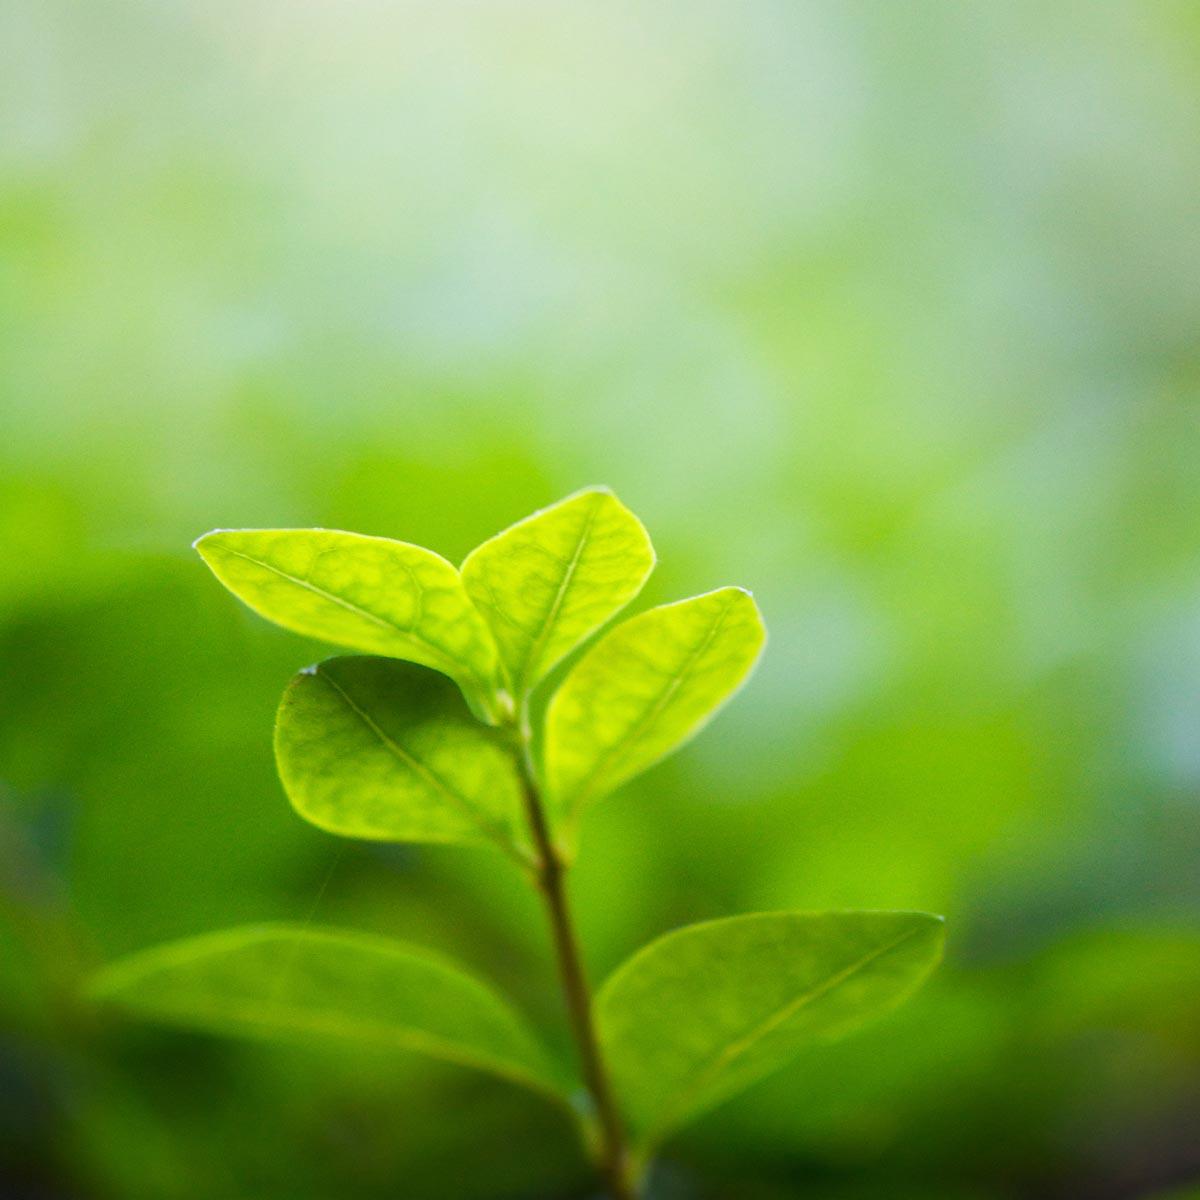 leaf-background